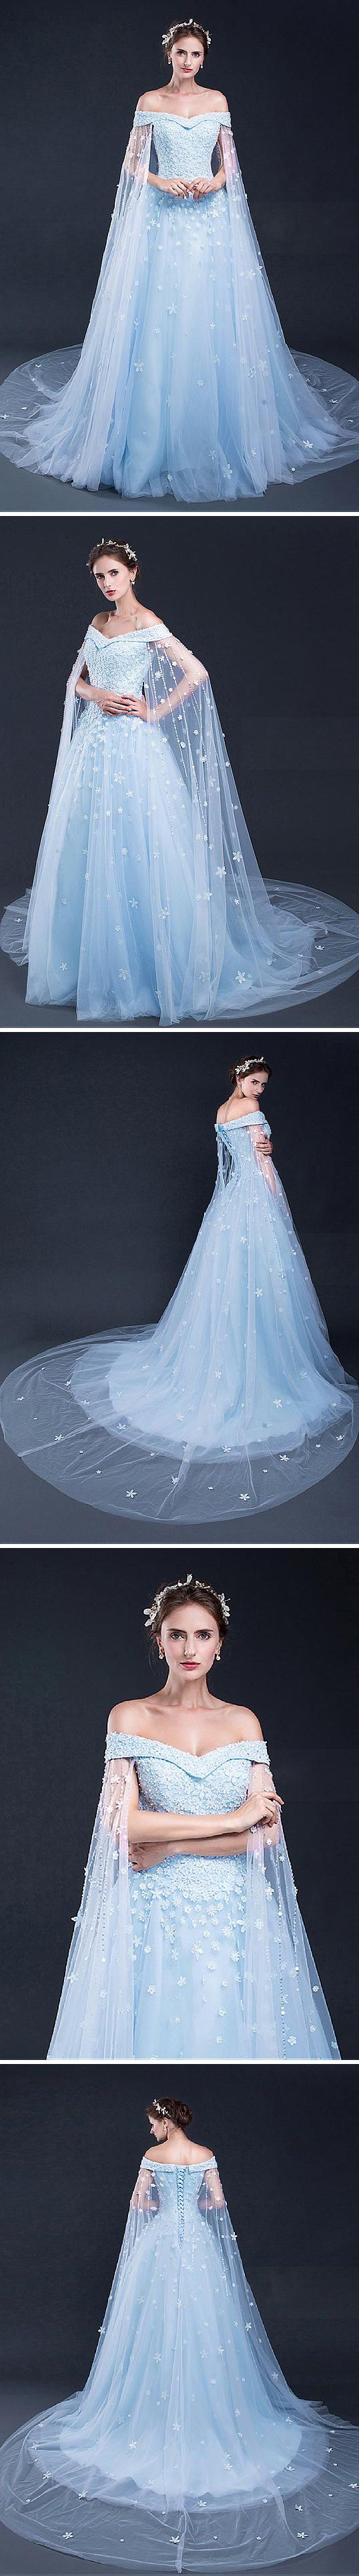 Frozen Wedding Theme Dress Fantastical Weddings Dresses fantasticalweddings.com Marvelous Tulle Off-the-shoulder Neckline A-line Prom Dresses With Beaded Lace Appliqués | dressilyme.com